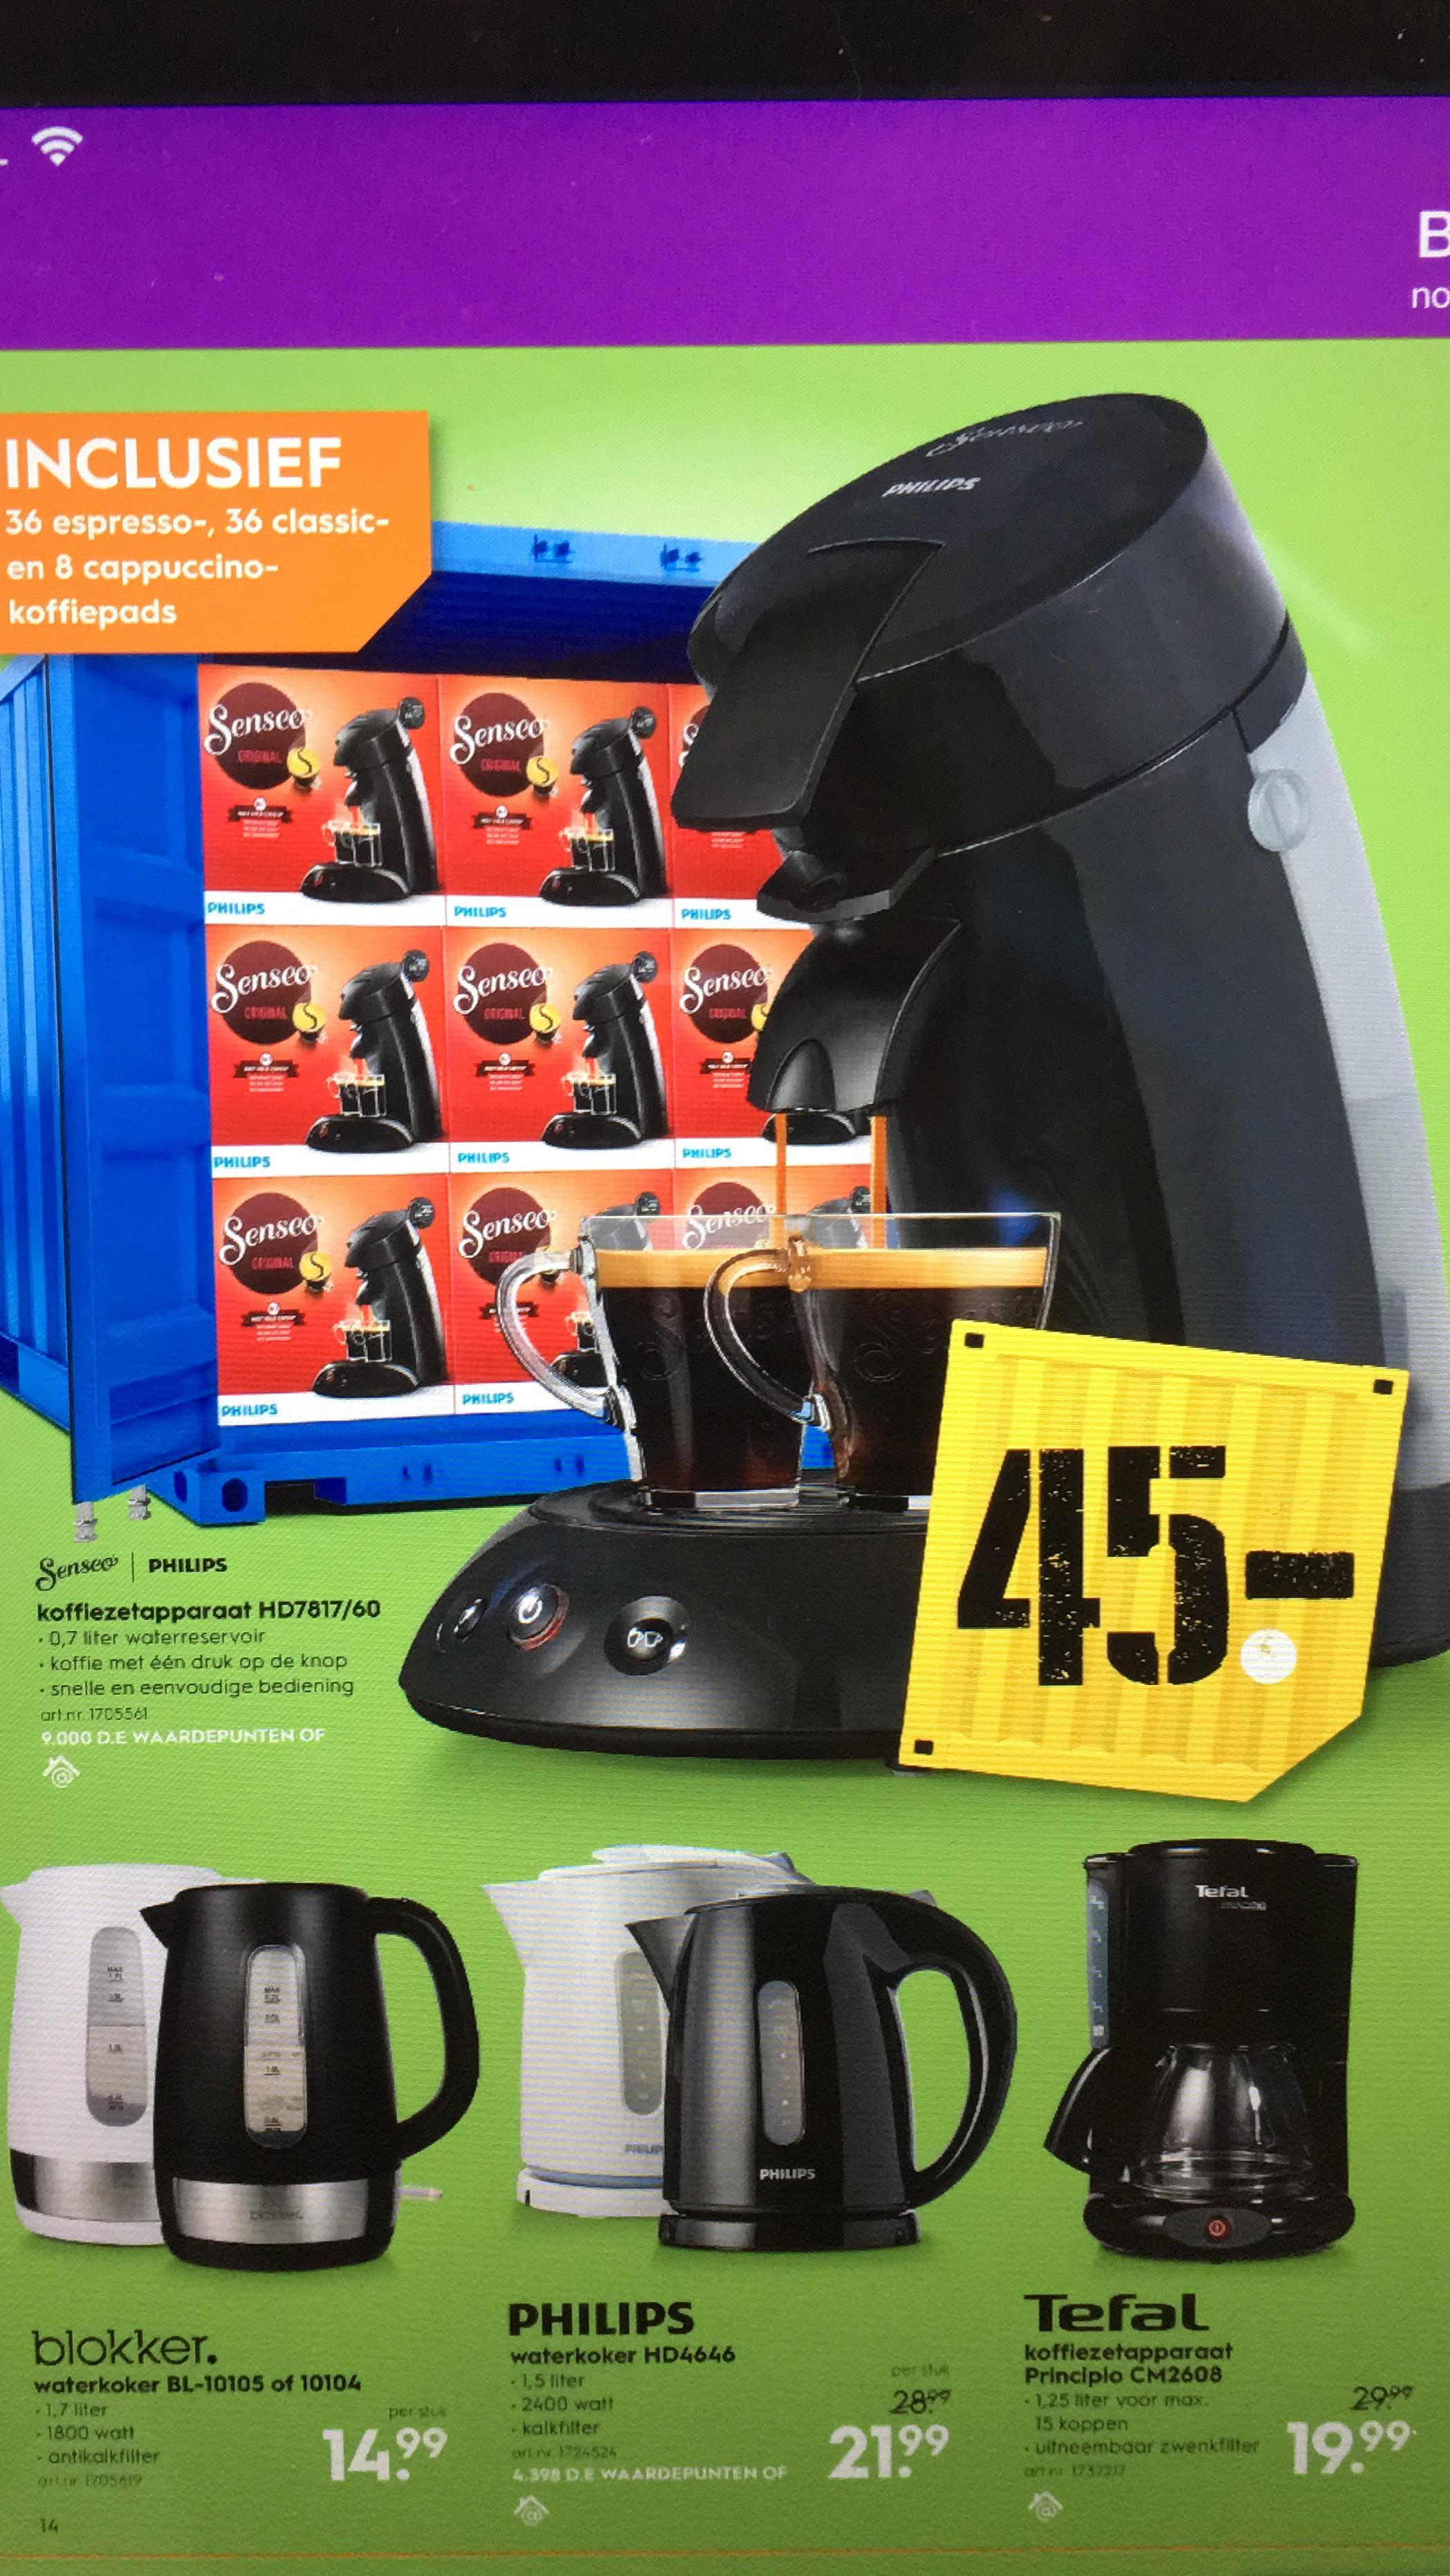 Senseo koffiezetapparaat HD7817/60